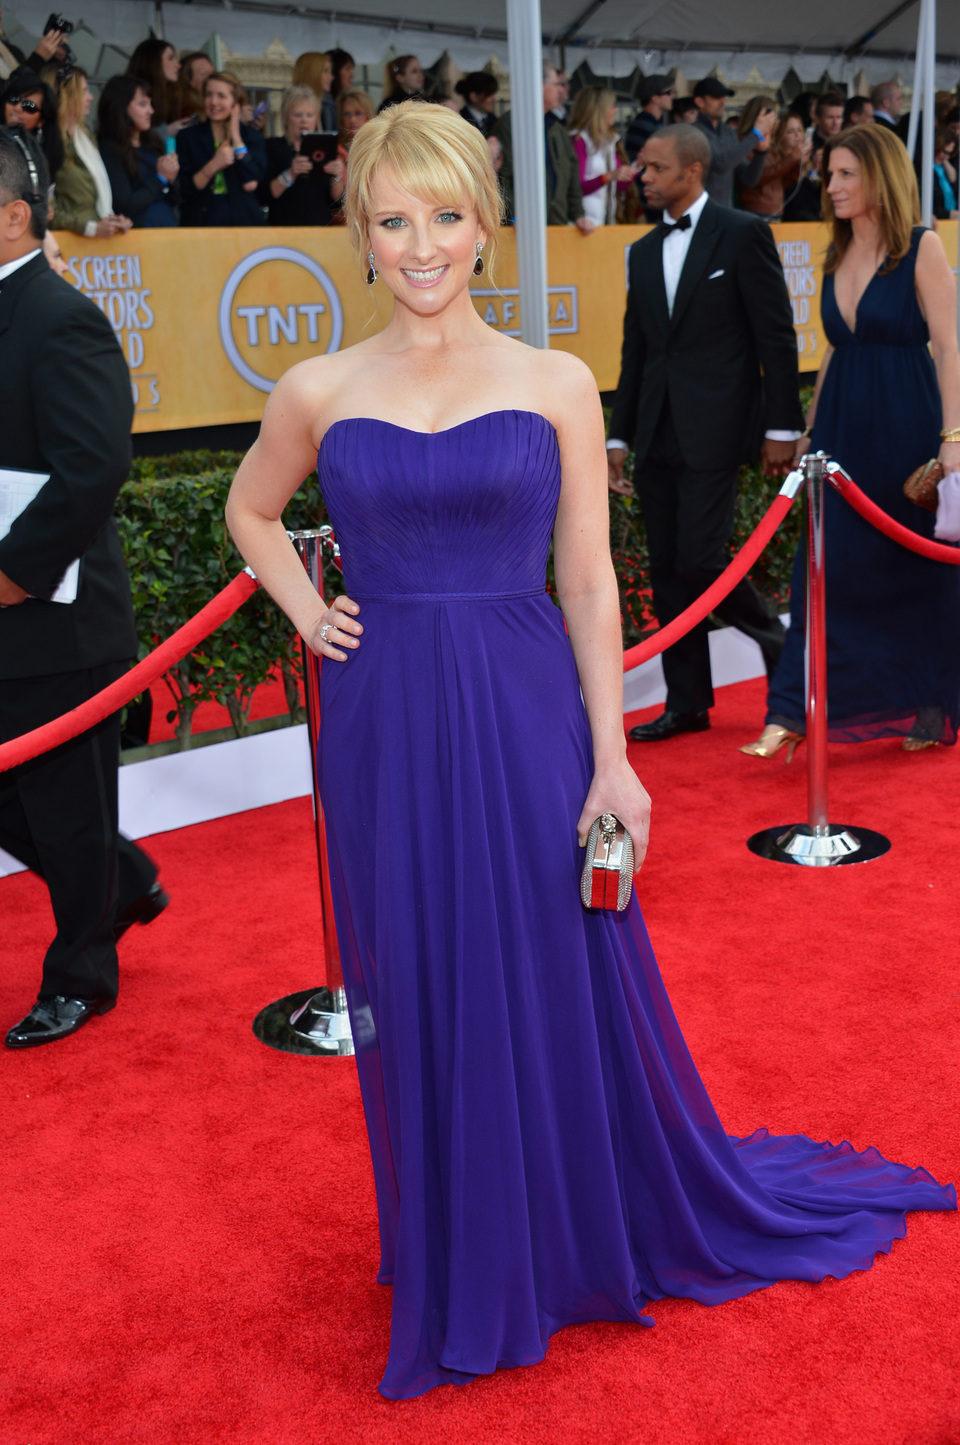 Melissa Rauch en la alfombra roja de los Screen Actors Guild Awards 2013